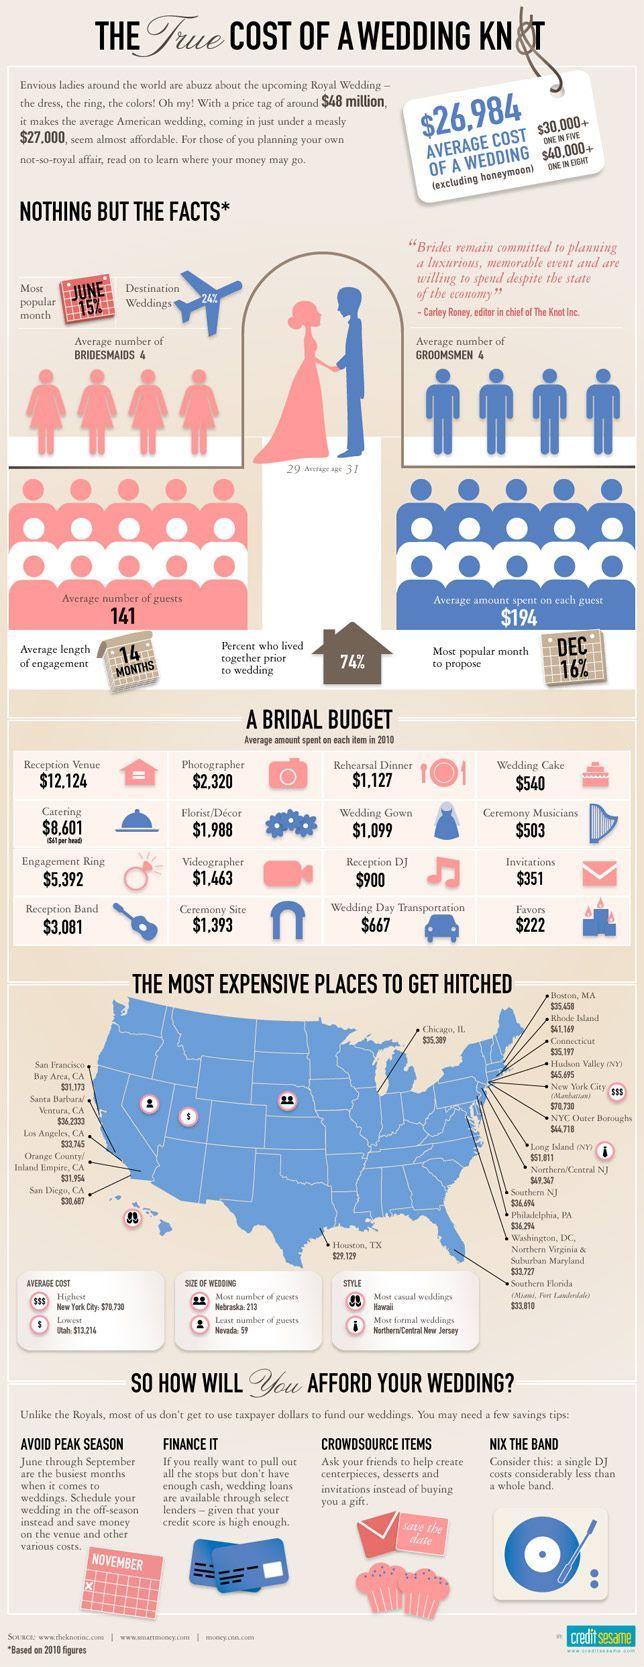 Top 5 Wedding Planning and Budget Checklists - MODwedding